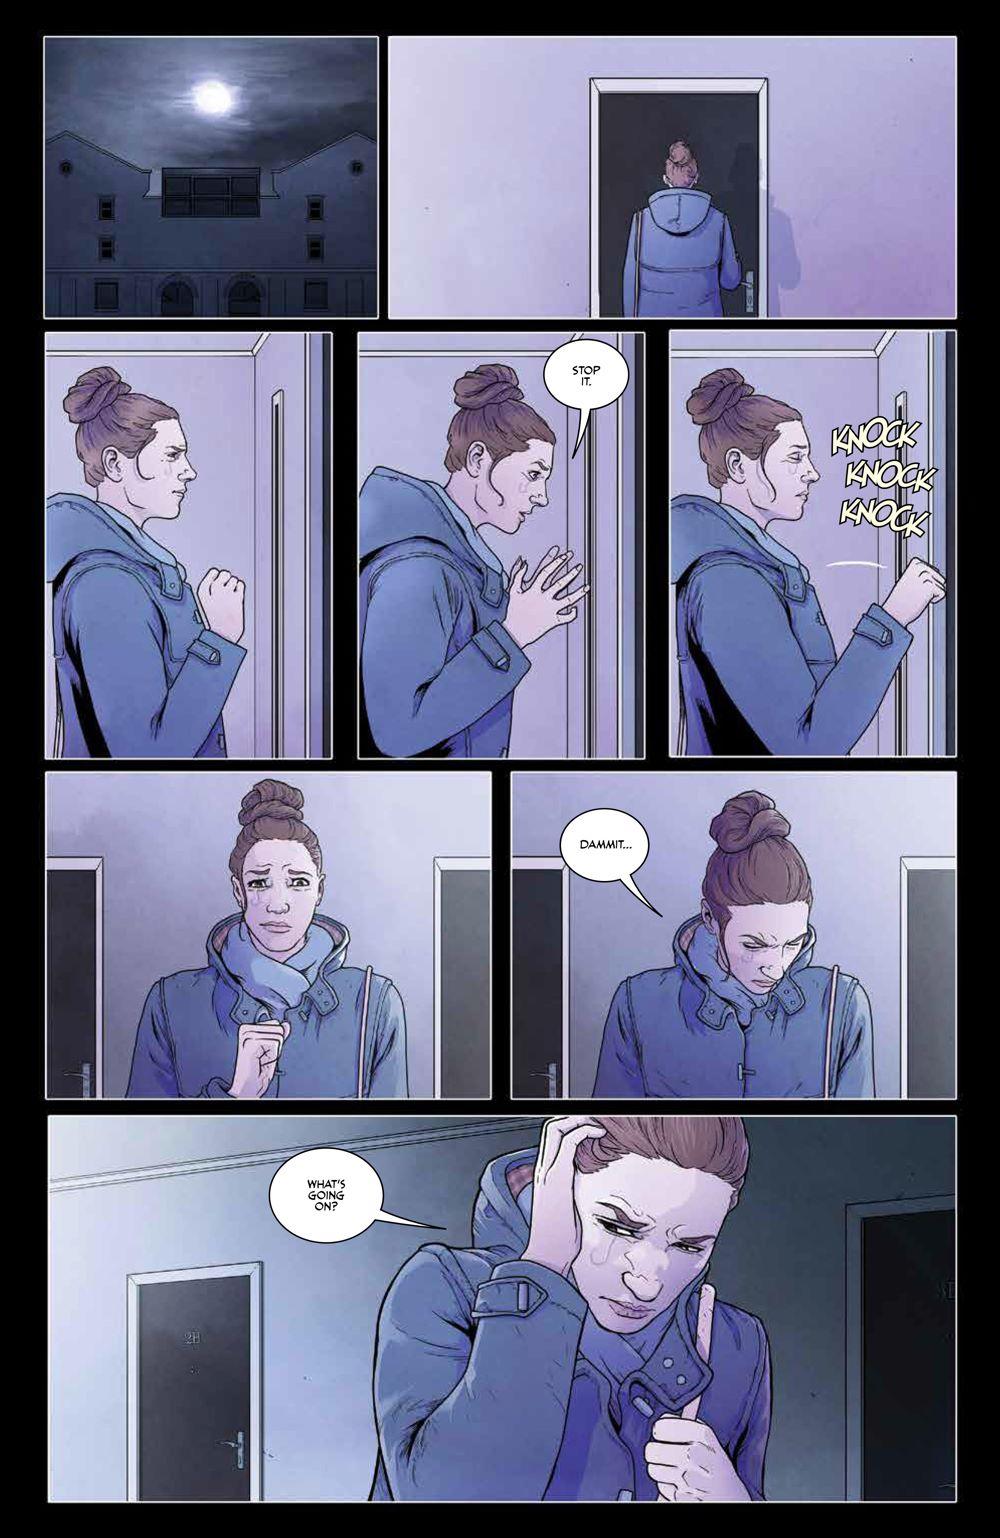 RedMother_v3_SC_PRESS_23 ComicList Previews: RED MOTHER VOLUME 3 TP